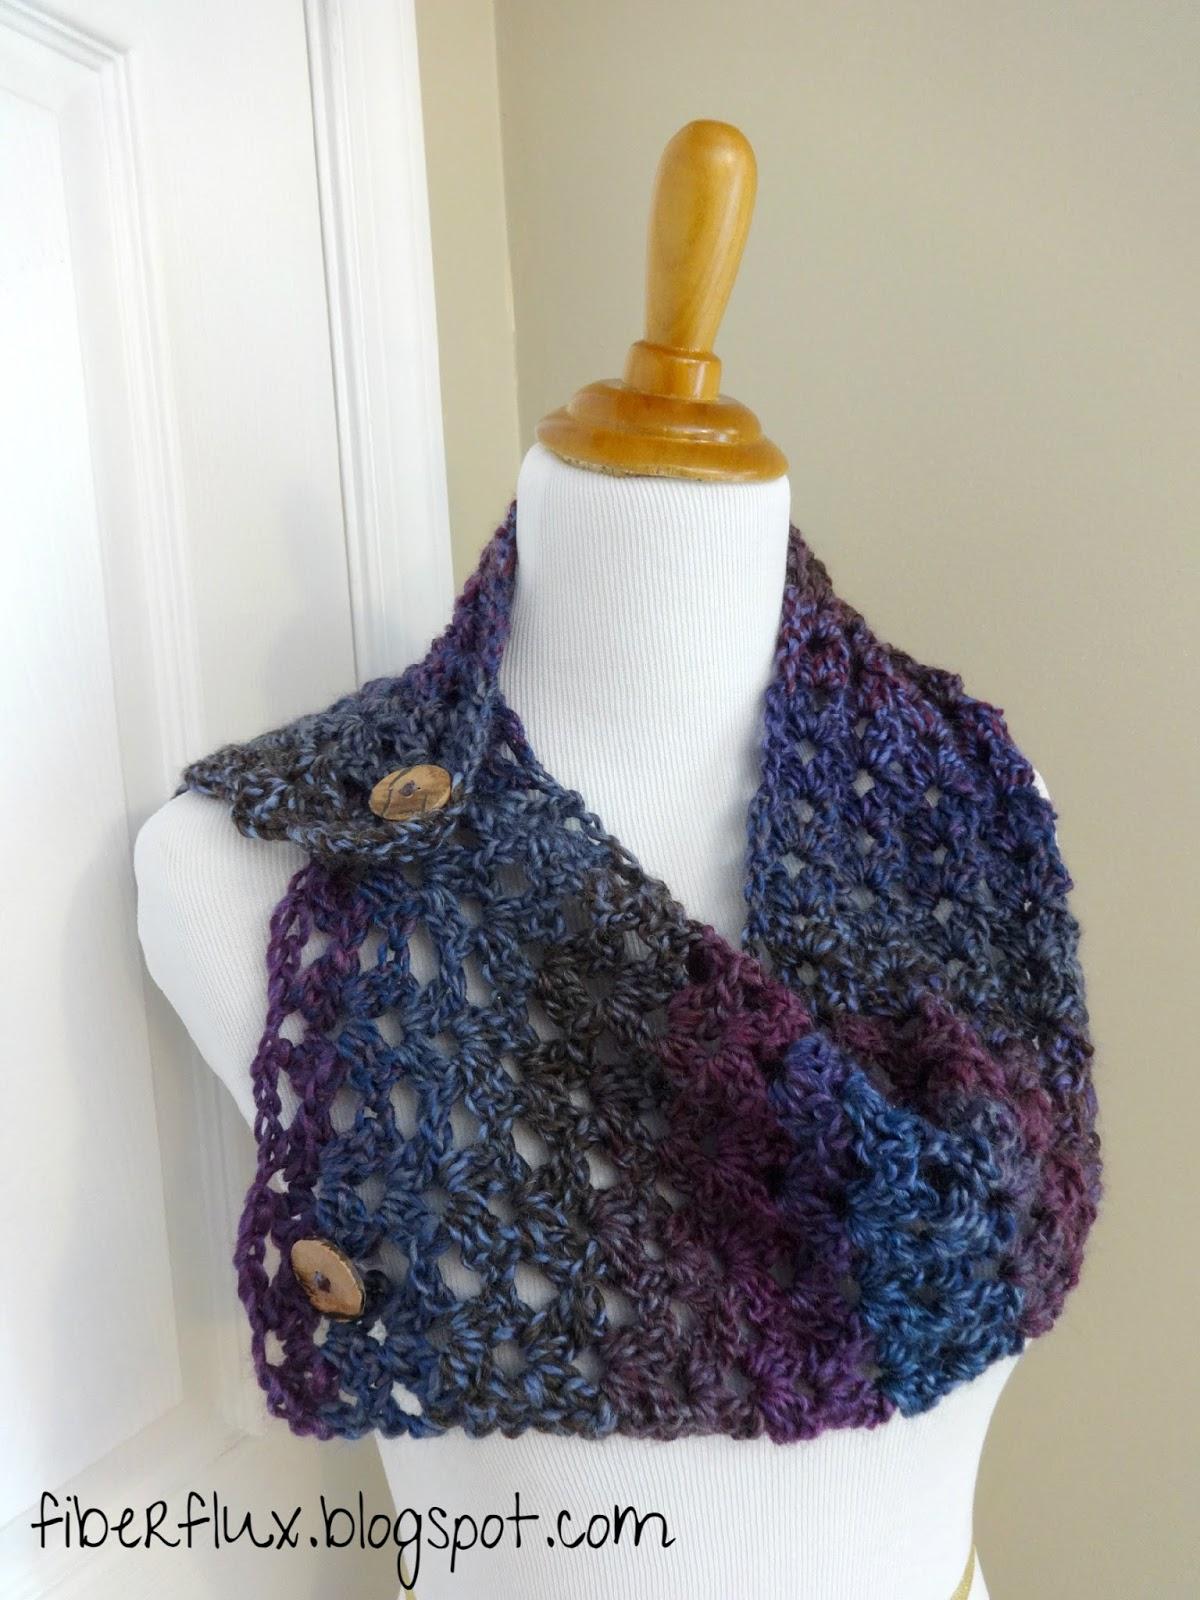 Free Crochet Patterns Button Cowl : Fiber Flux: Free Crochet Pattern...Estelle Button Cowl!